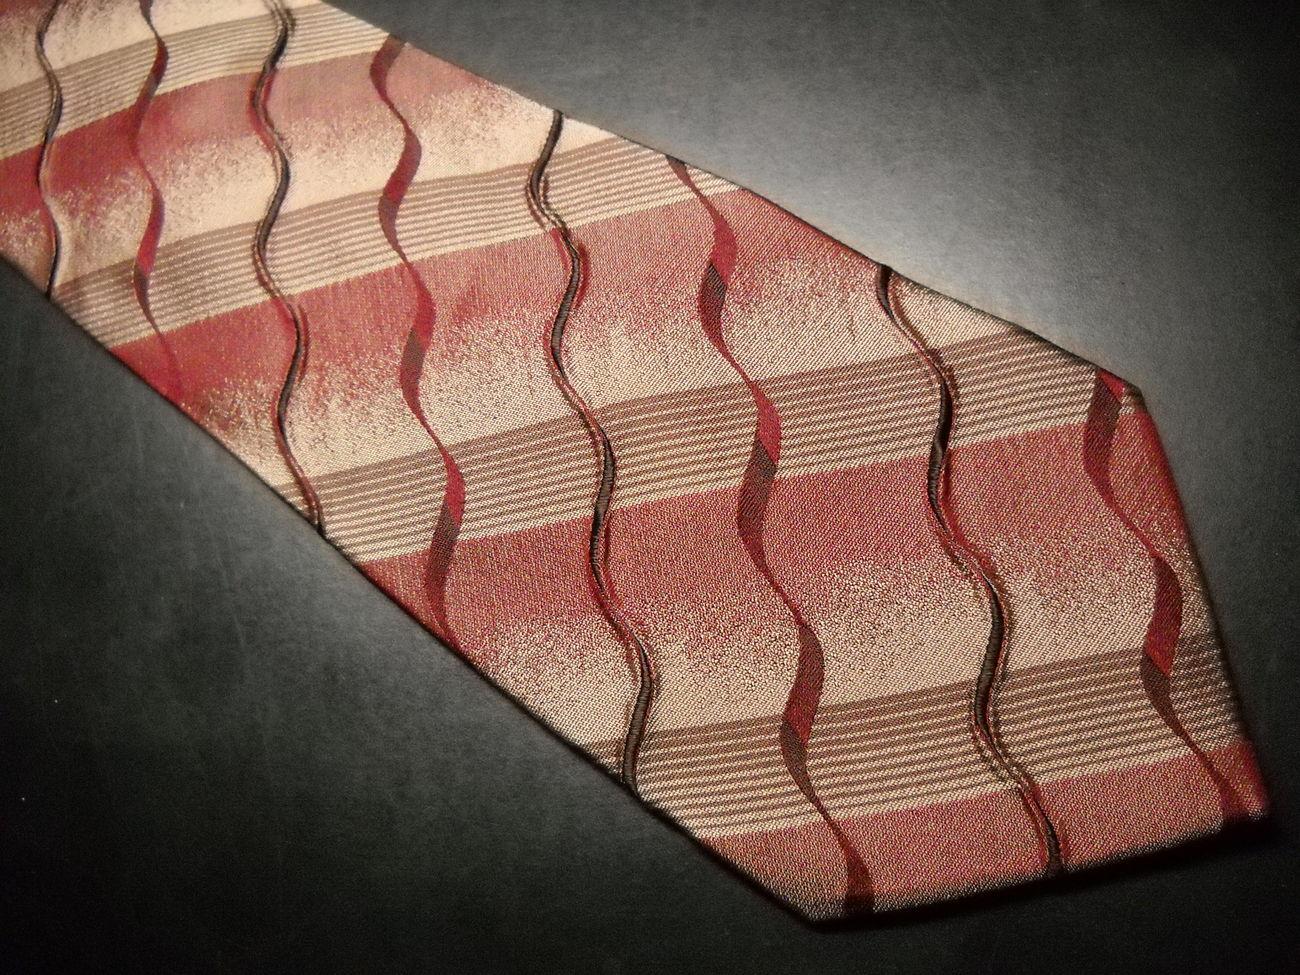 Emilio Ponti Silk Neck Tie Textured Ragged Rusts and Browns Emilio Ponti